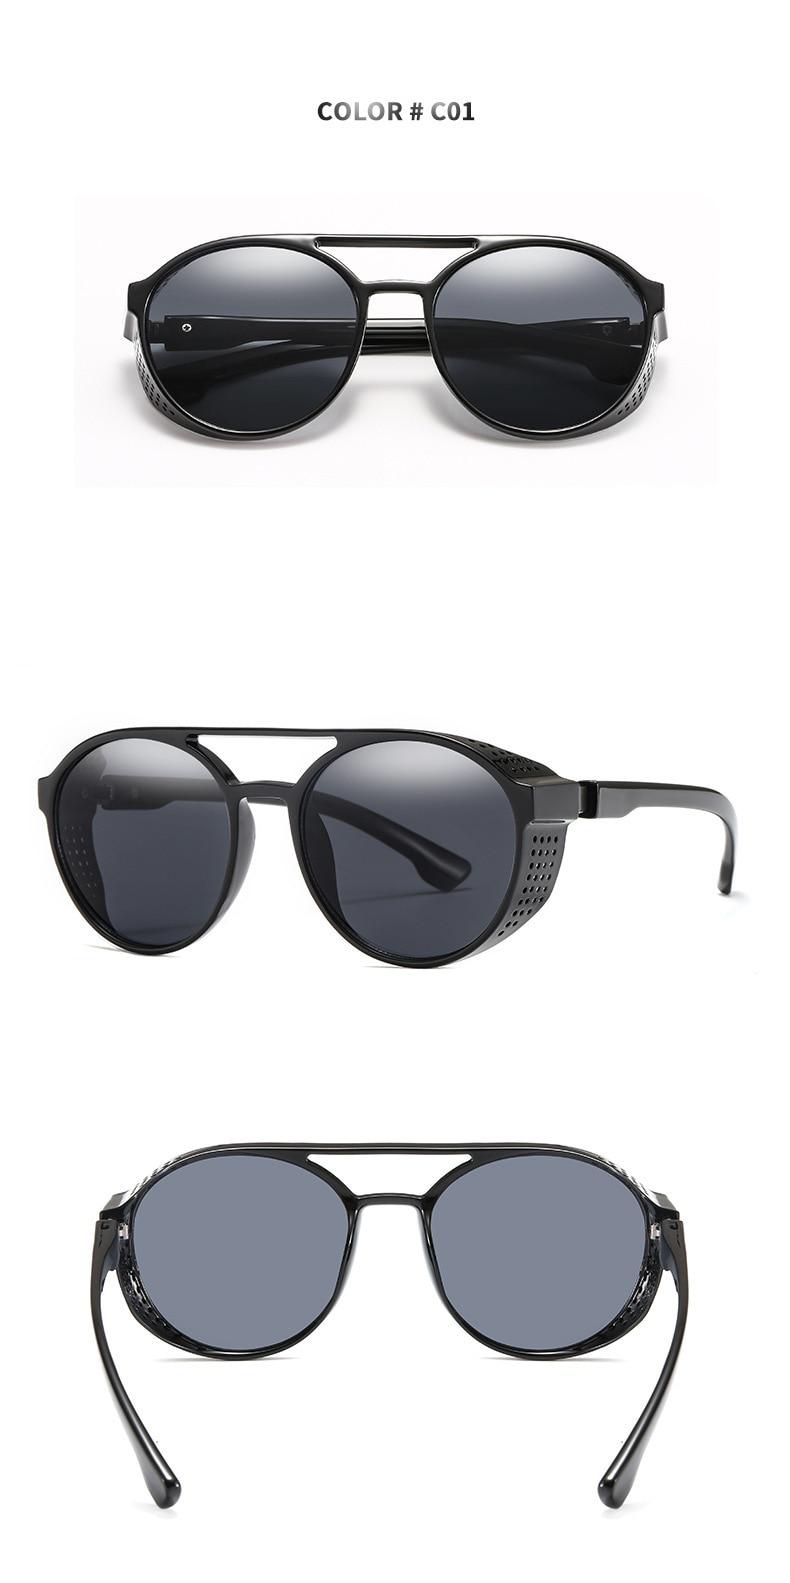 Men's sunglasses plastic + metal round frame glasses UV400 fashion ladies sunglasses classic brand driving night vision goggles (4)